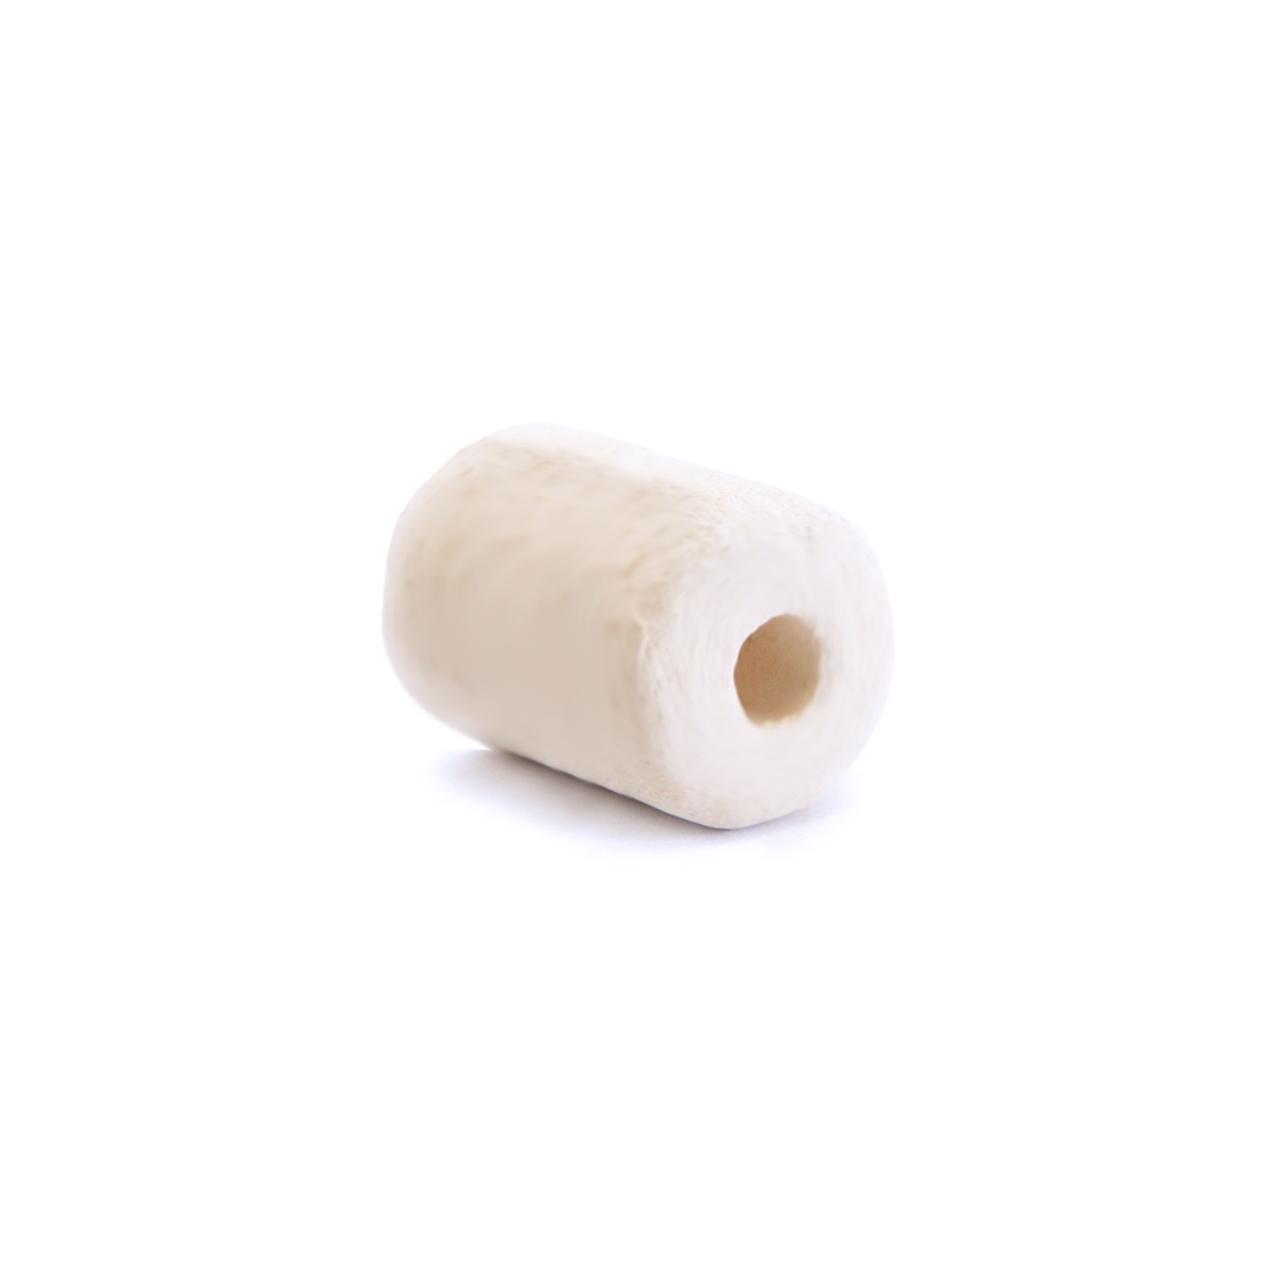 Ceramic Bead Unglazed - Small Tubular